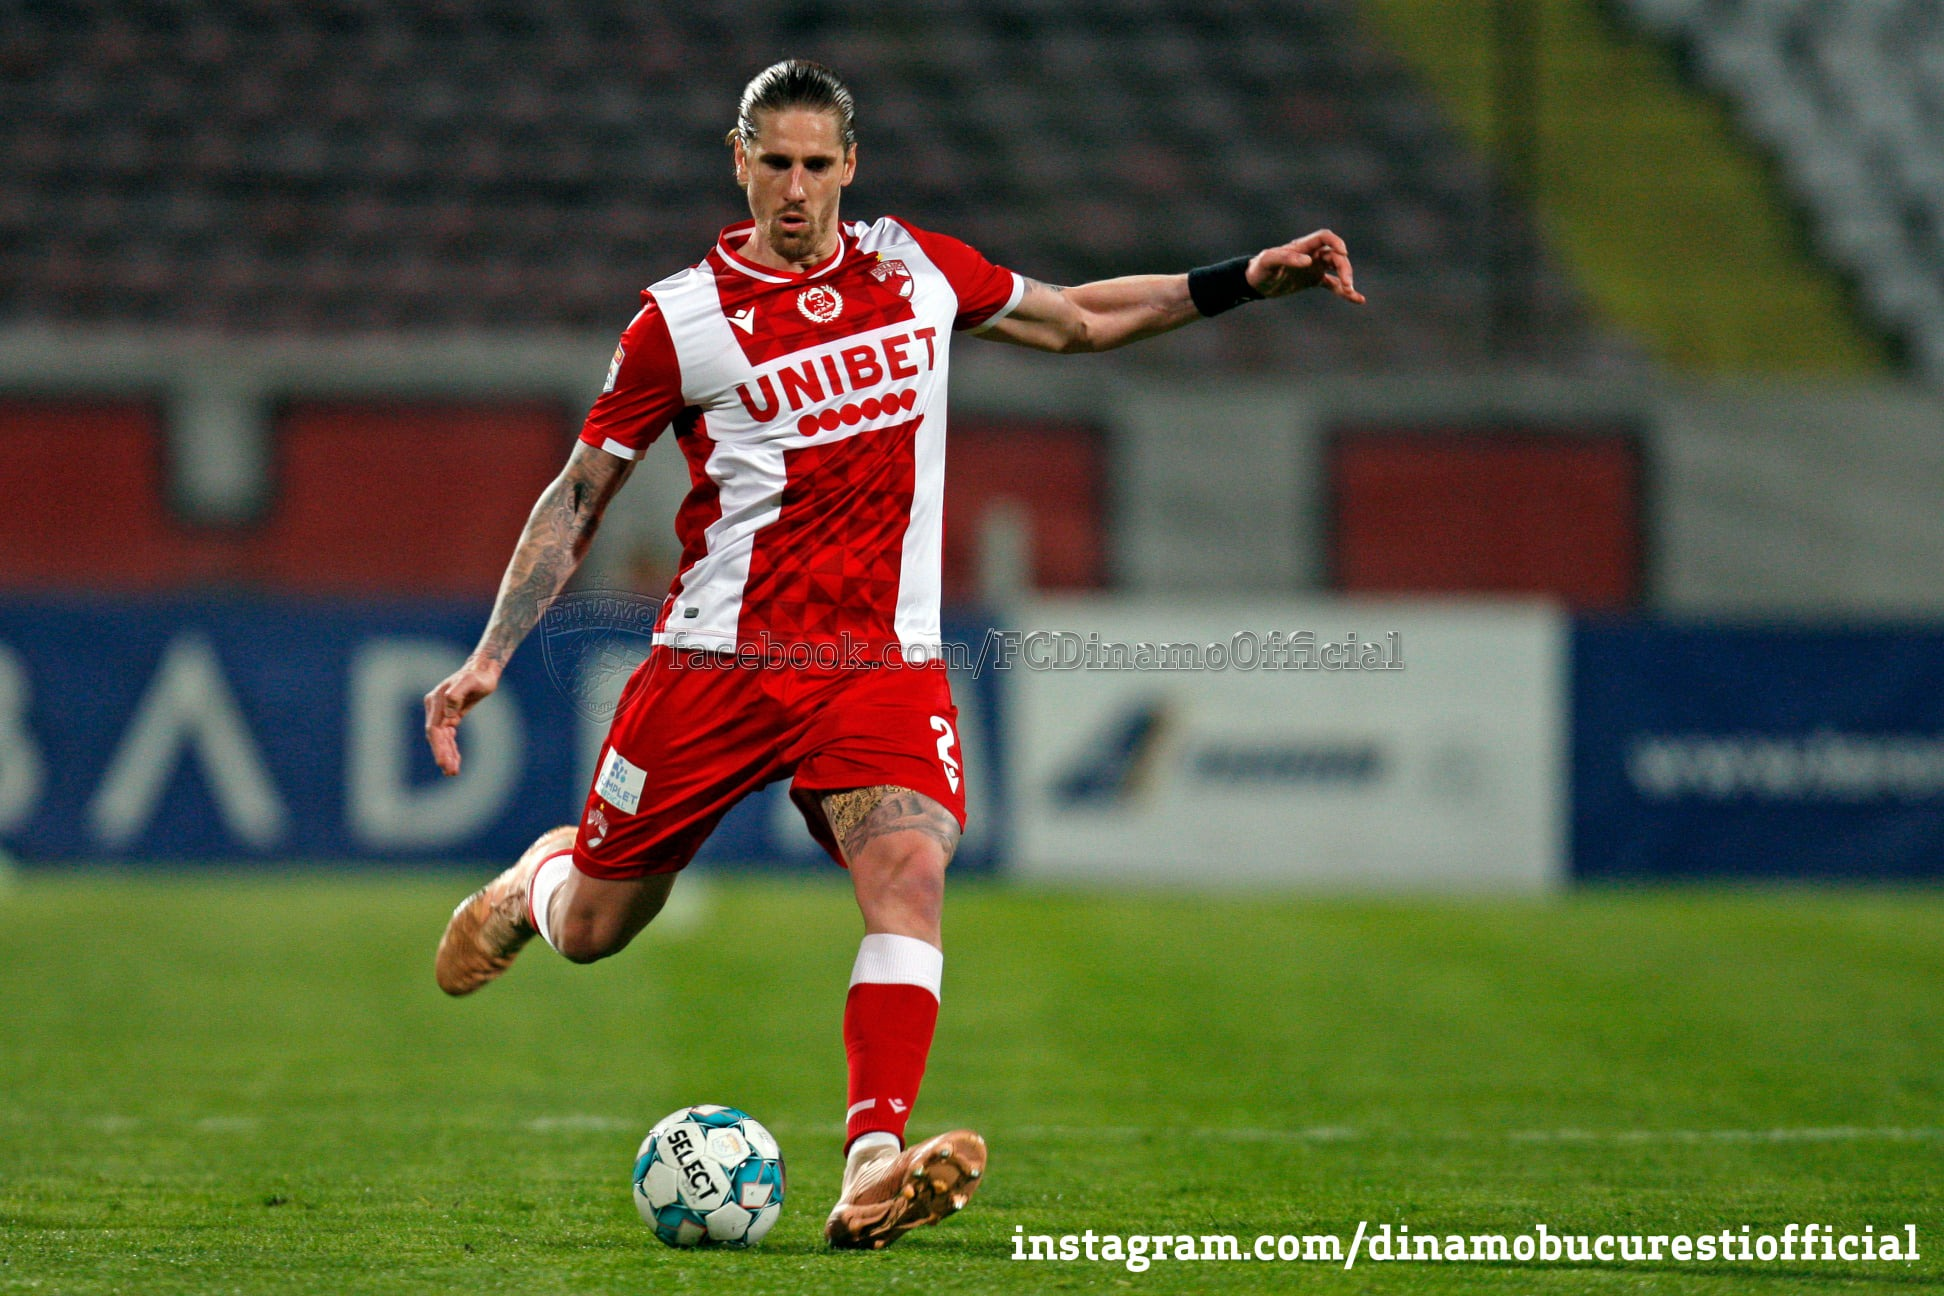 Dinamo Albentosa